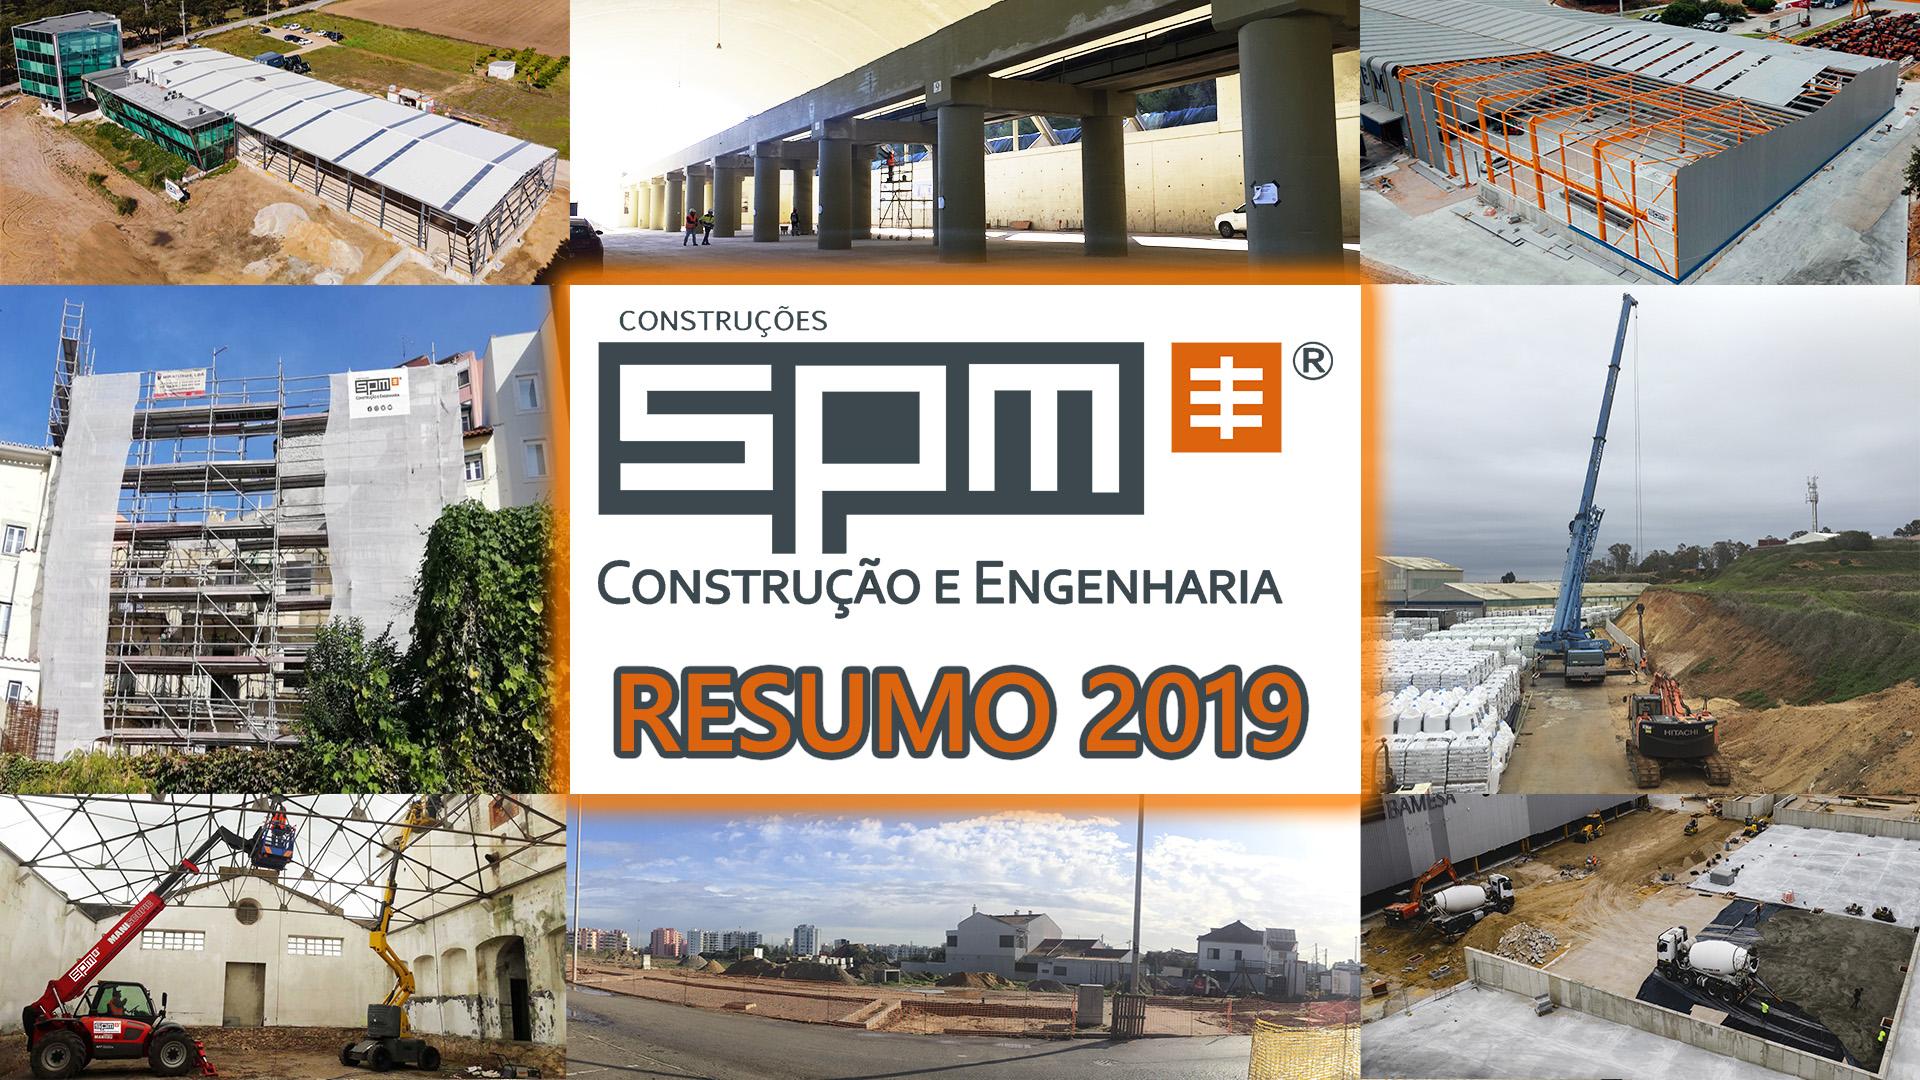 SPM | RESUMO 2019